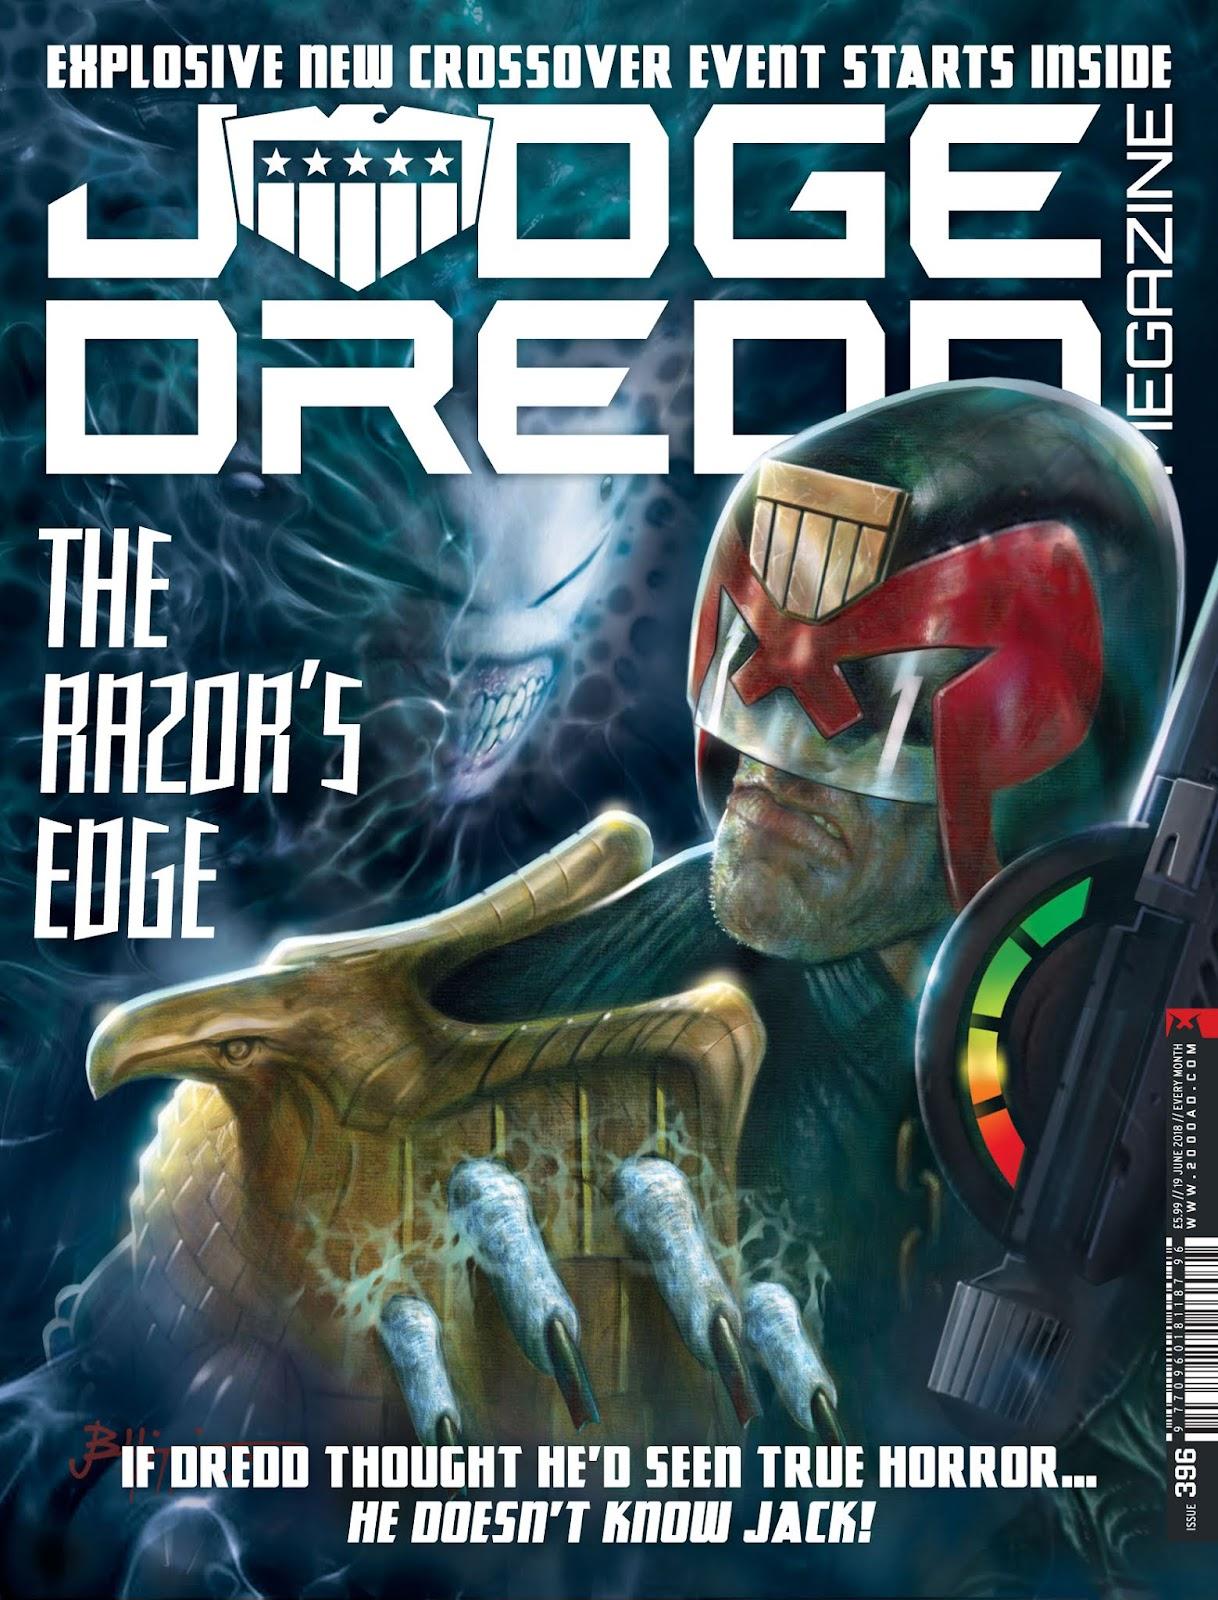 Judge Dredd Megazine (Vol. 5) issue 396 - Page 1